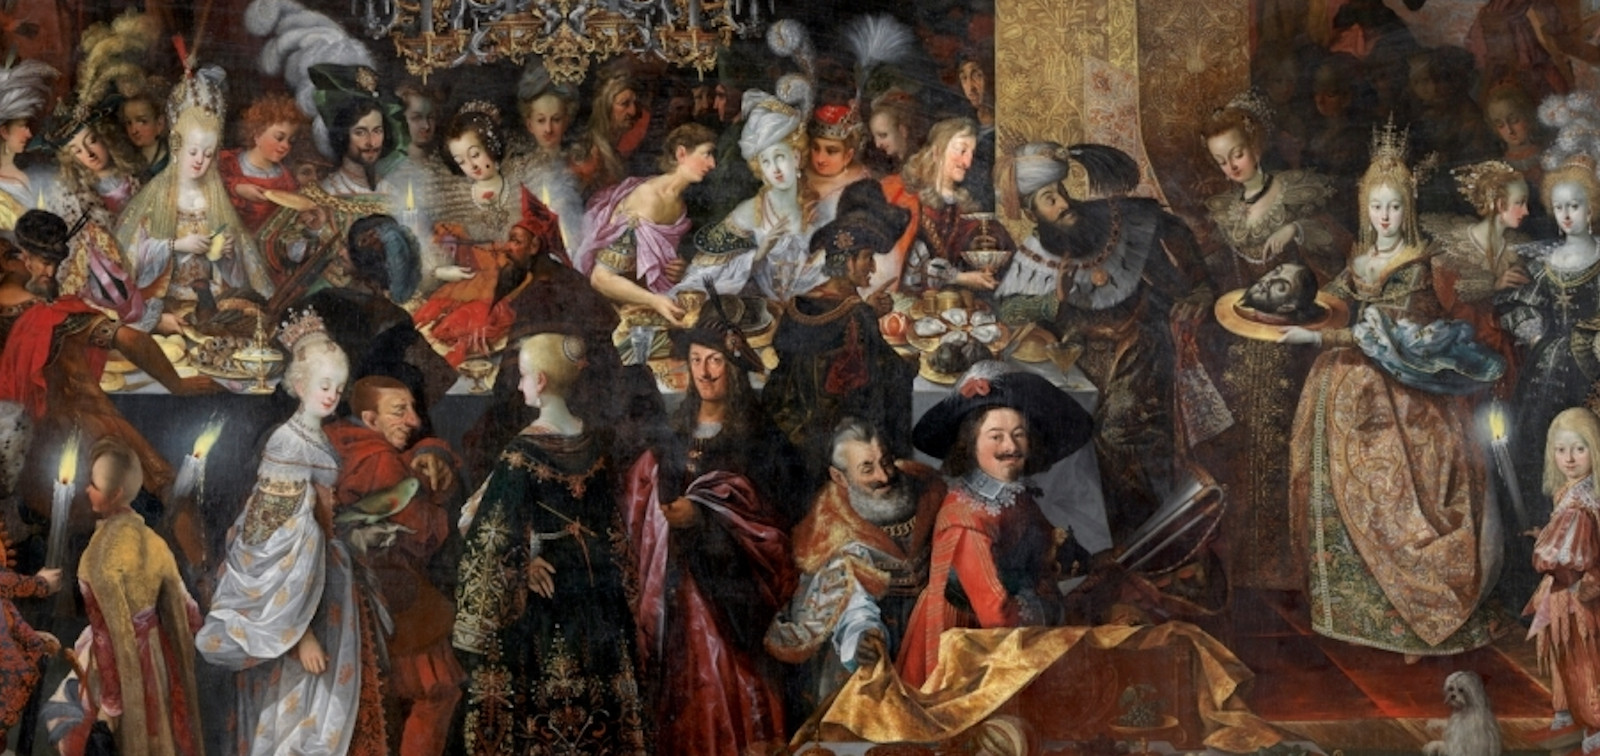 Una obra, un artista: <em>Degollación de San Juan Bautista y banquete de Herodes</em>, de Bartholomeus Strobel